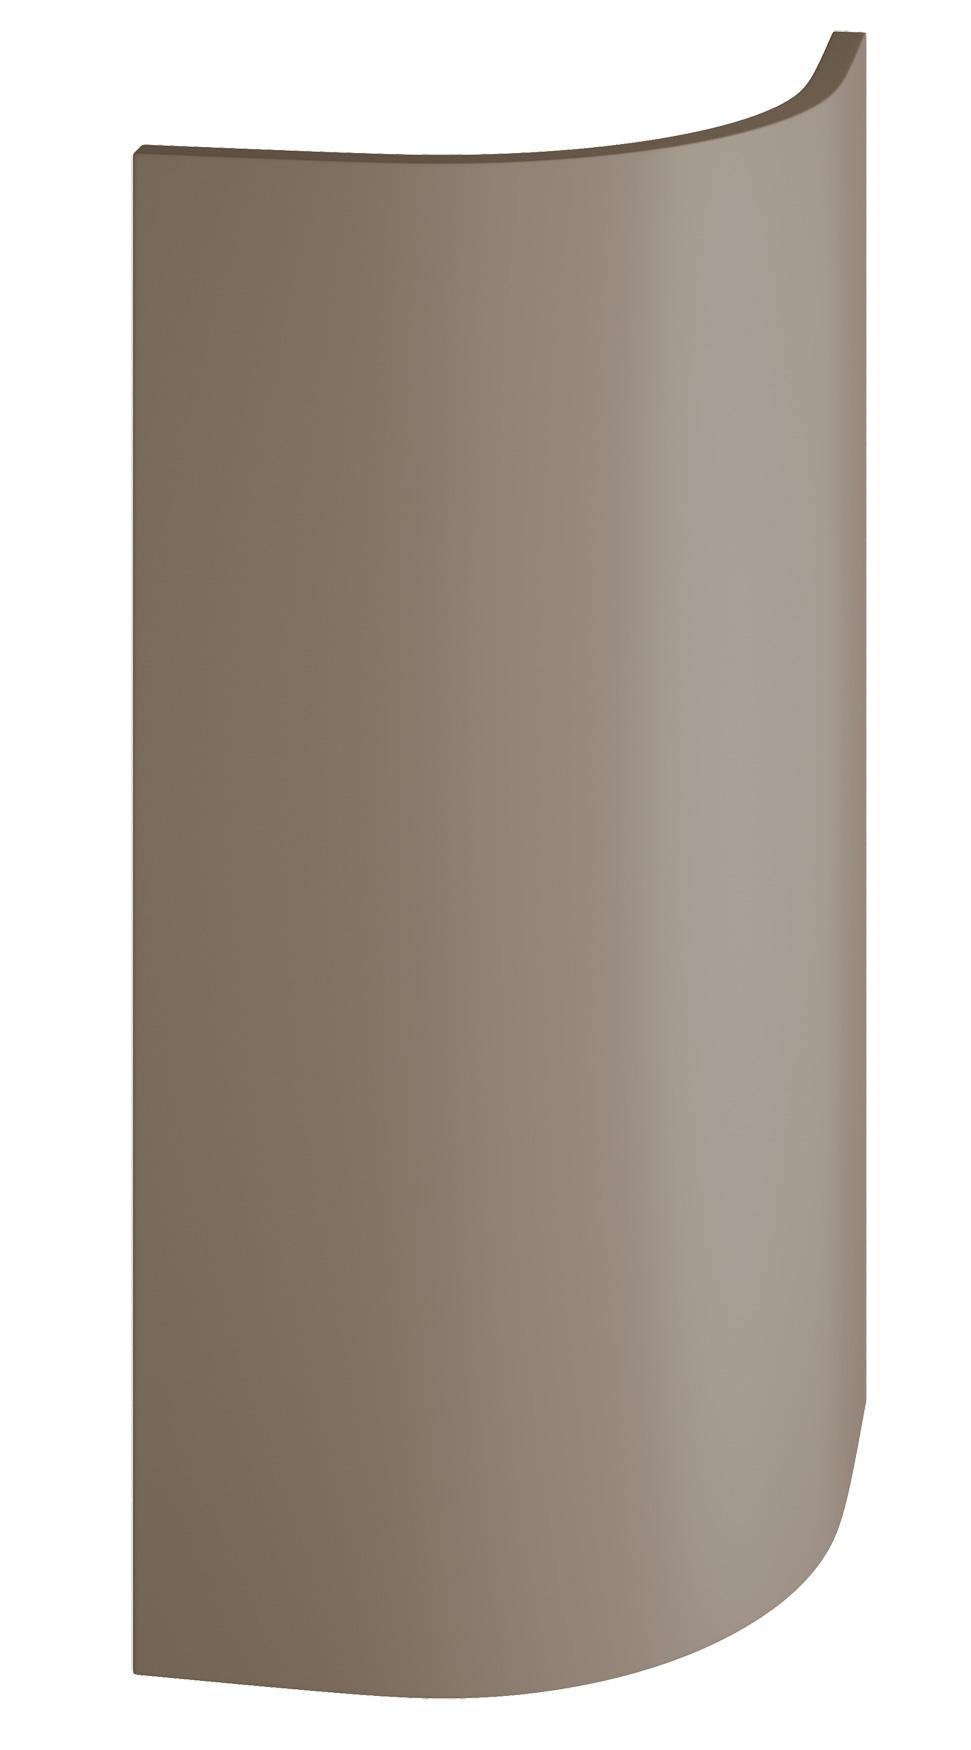 lusso-handpainted-brown-grey-curved-door